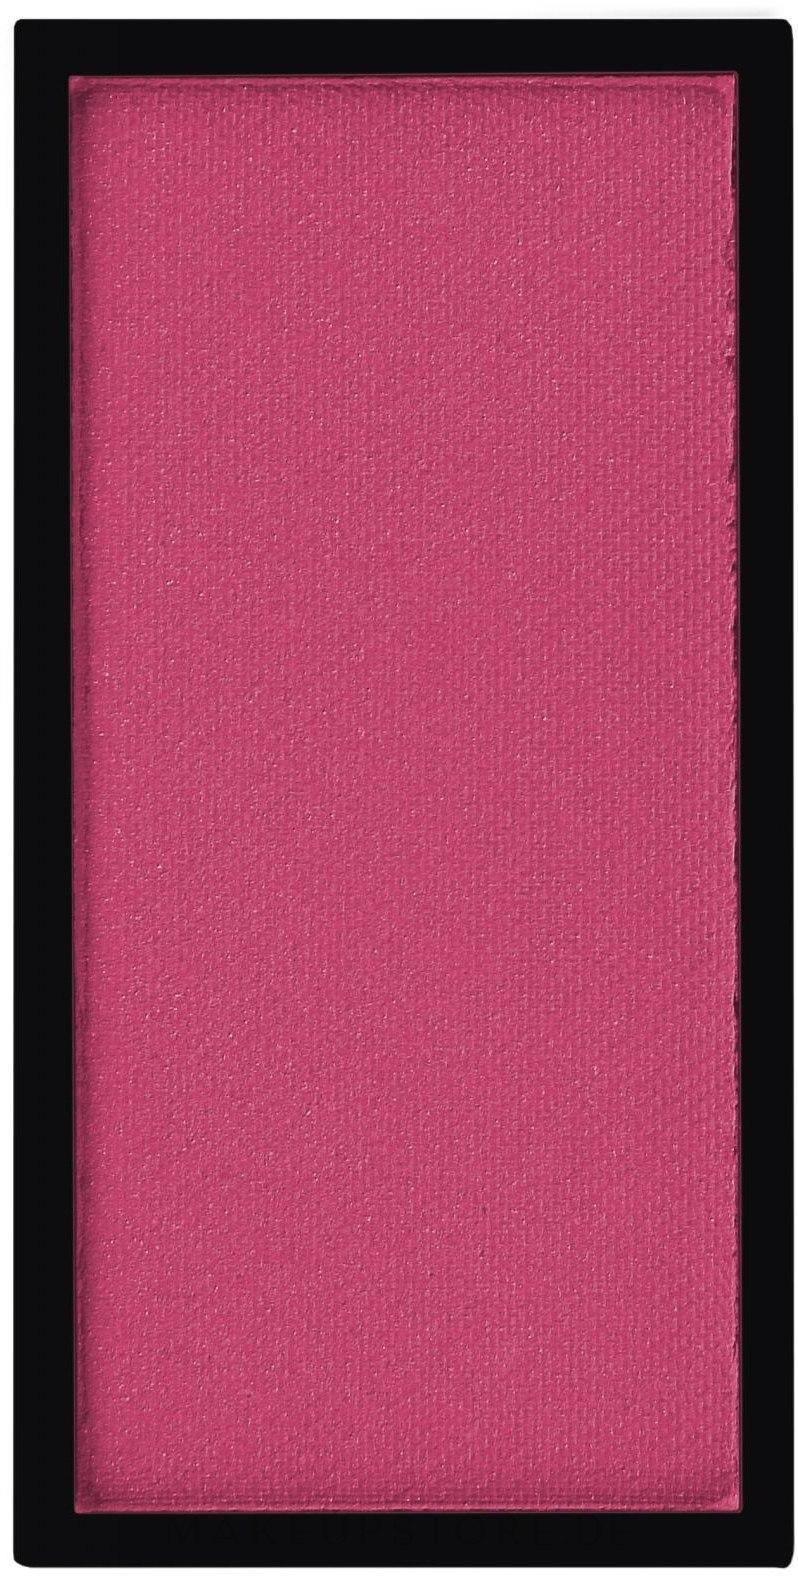 Kompakt-Rouge - Vipera Pressed Blush — Bild RR01 - Pink Rock